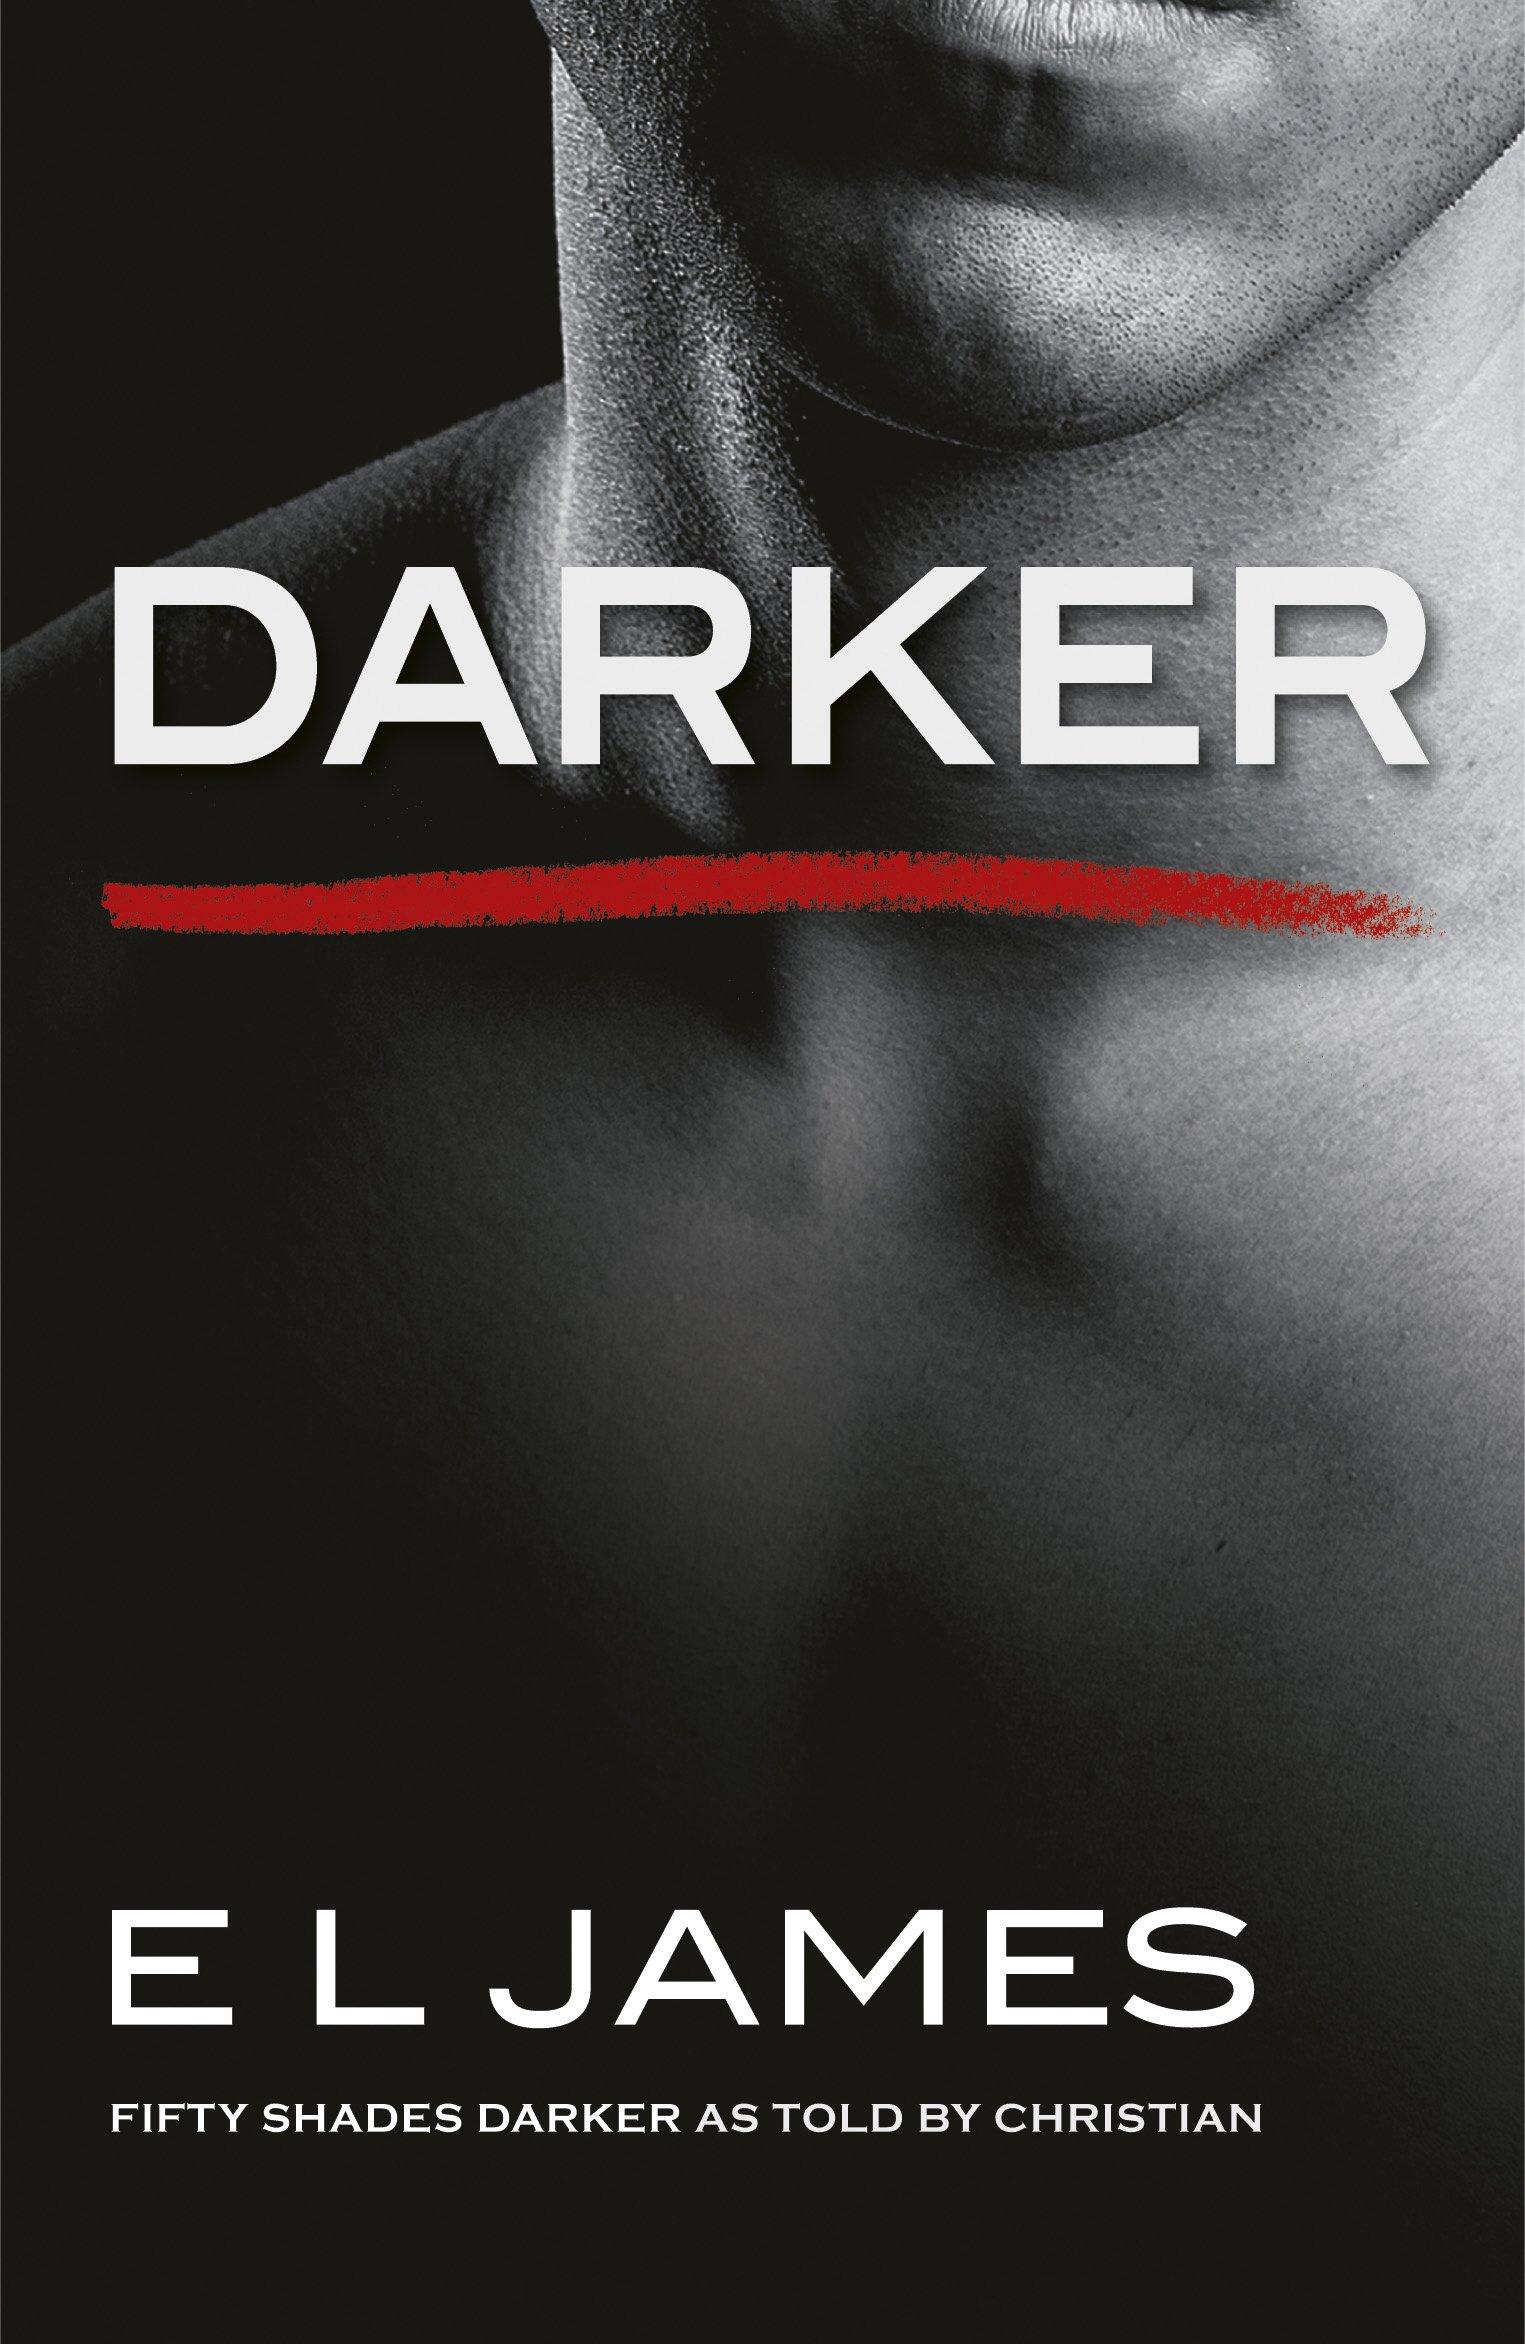 fifty shades darker full movie free putlockers